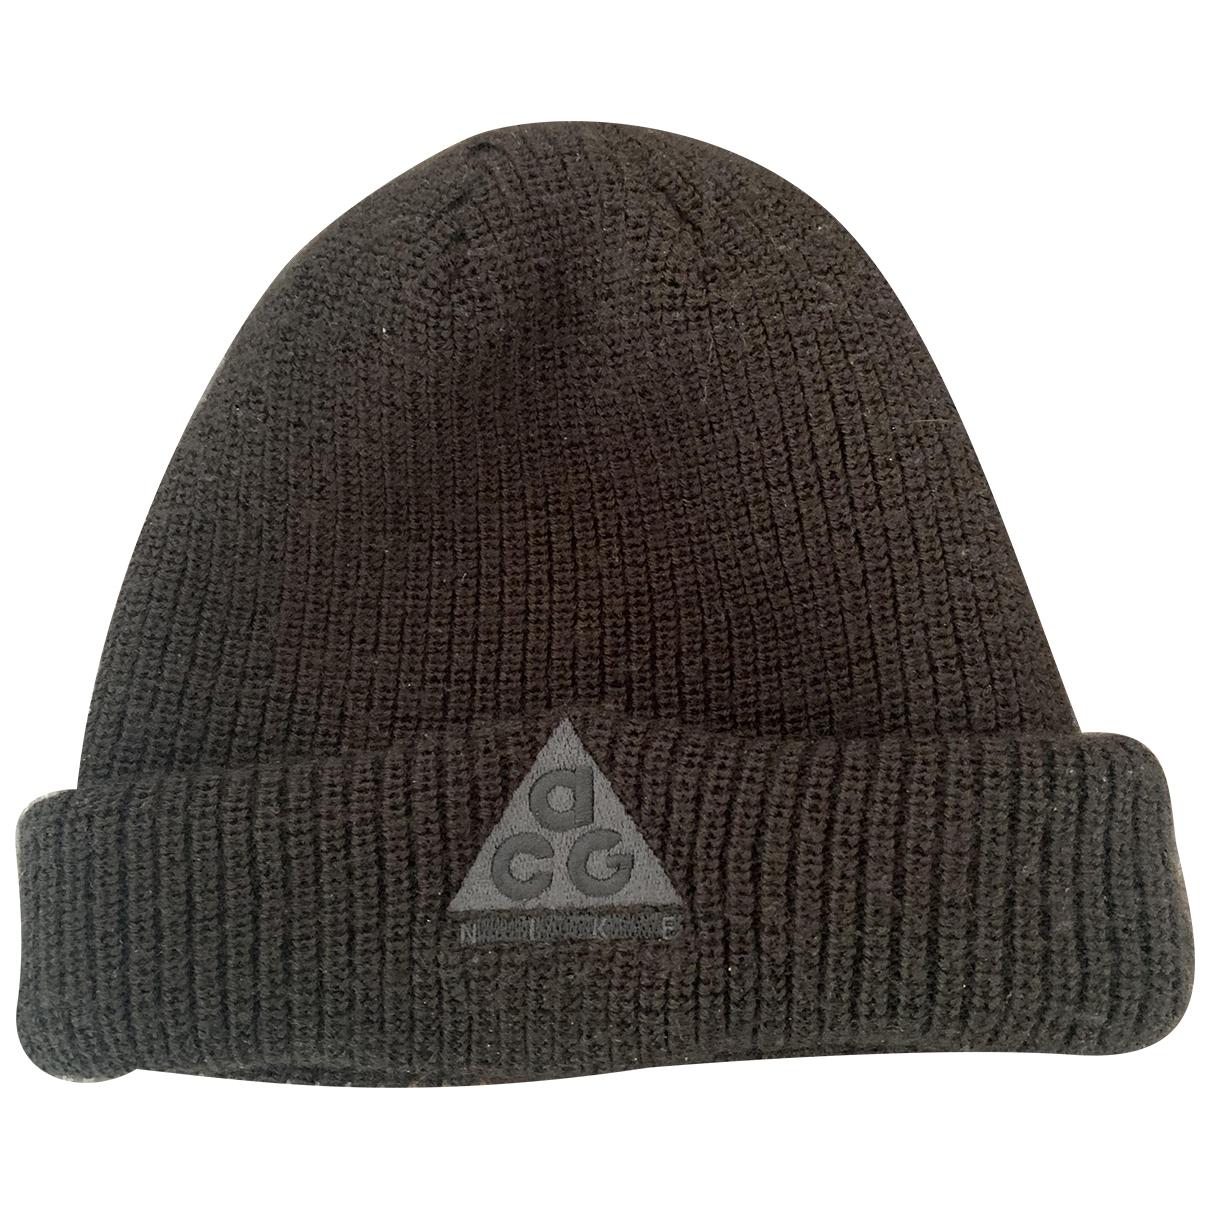 Sombrero / gorro de Lana Nike Acg